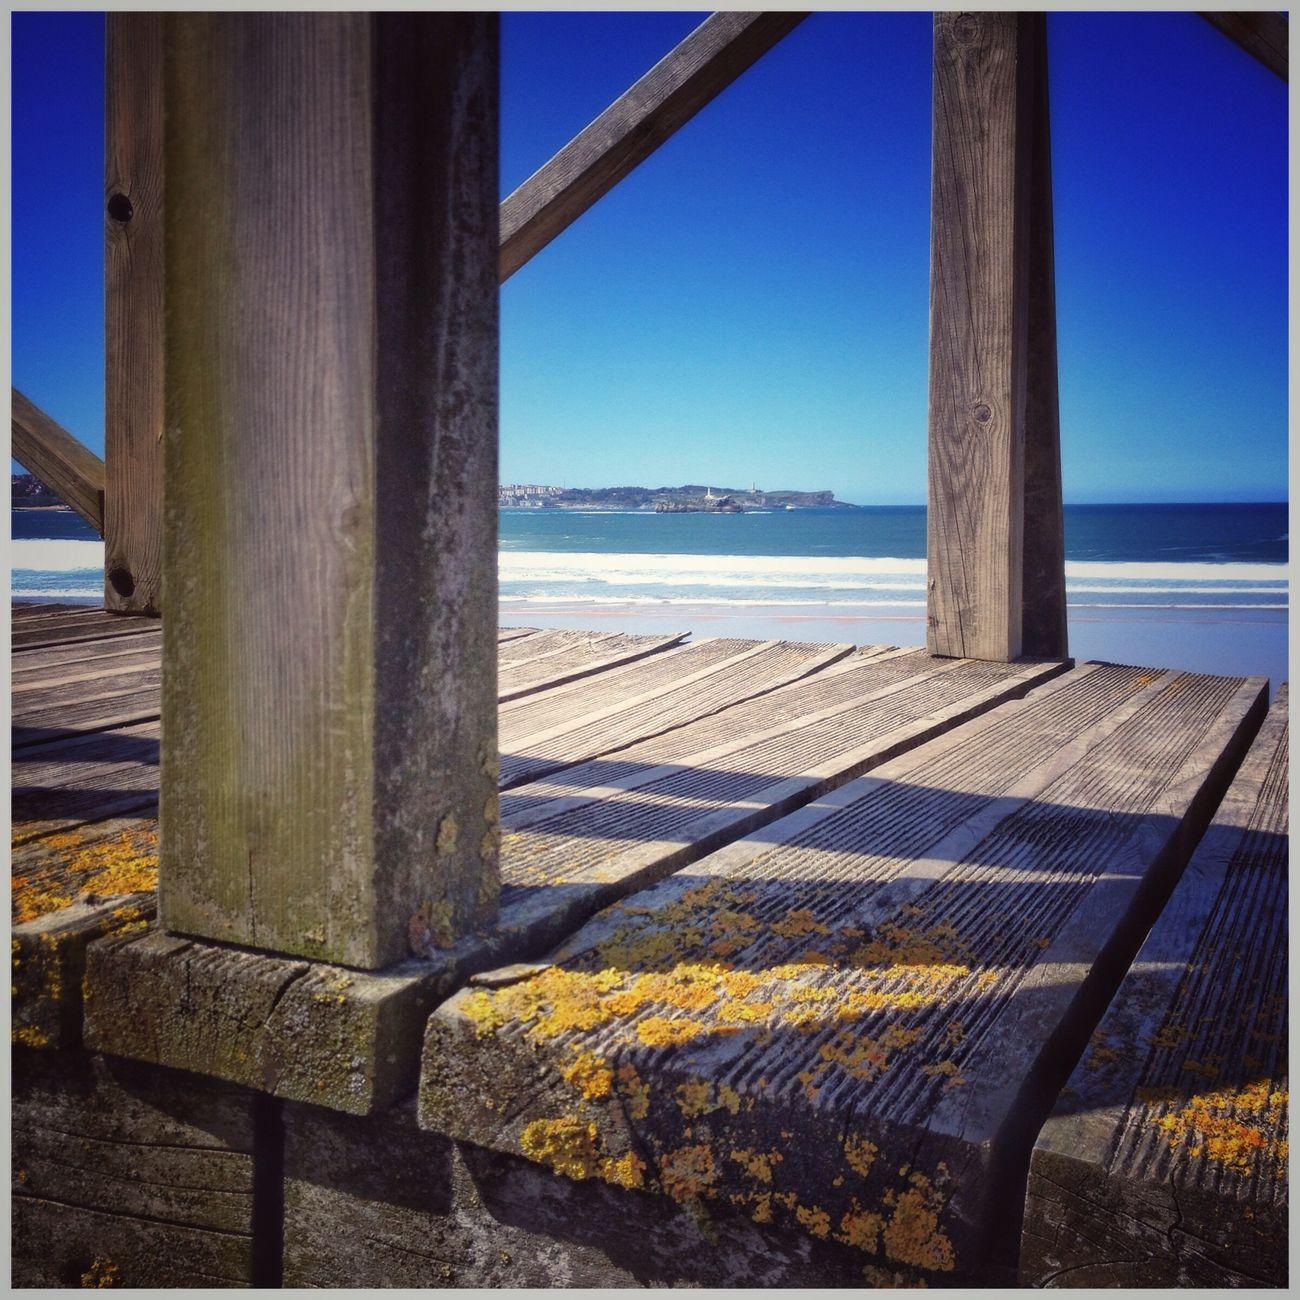 Enjoying The Sun Sea Relaxing IPhoneography Cantabriainfinita View Movilgrafias Cantabria Popular Photos SPAIN Landscape_photography Santander #somo #surf #cantabria #sea Somo Landscape_Collection Enjoying Life Estaes_cantabria Good Atmosphere Relaxing